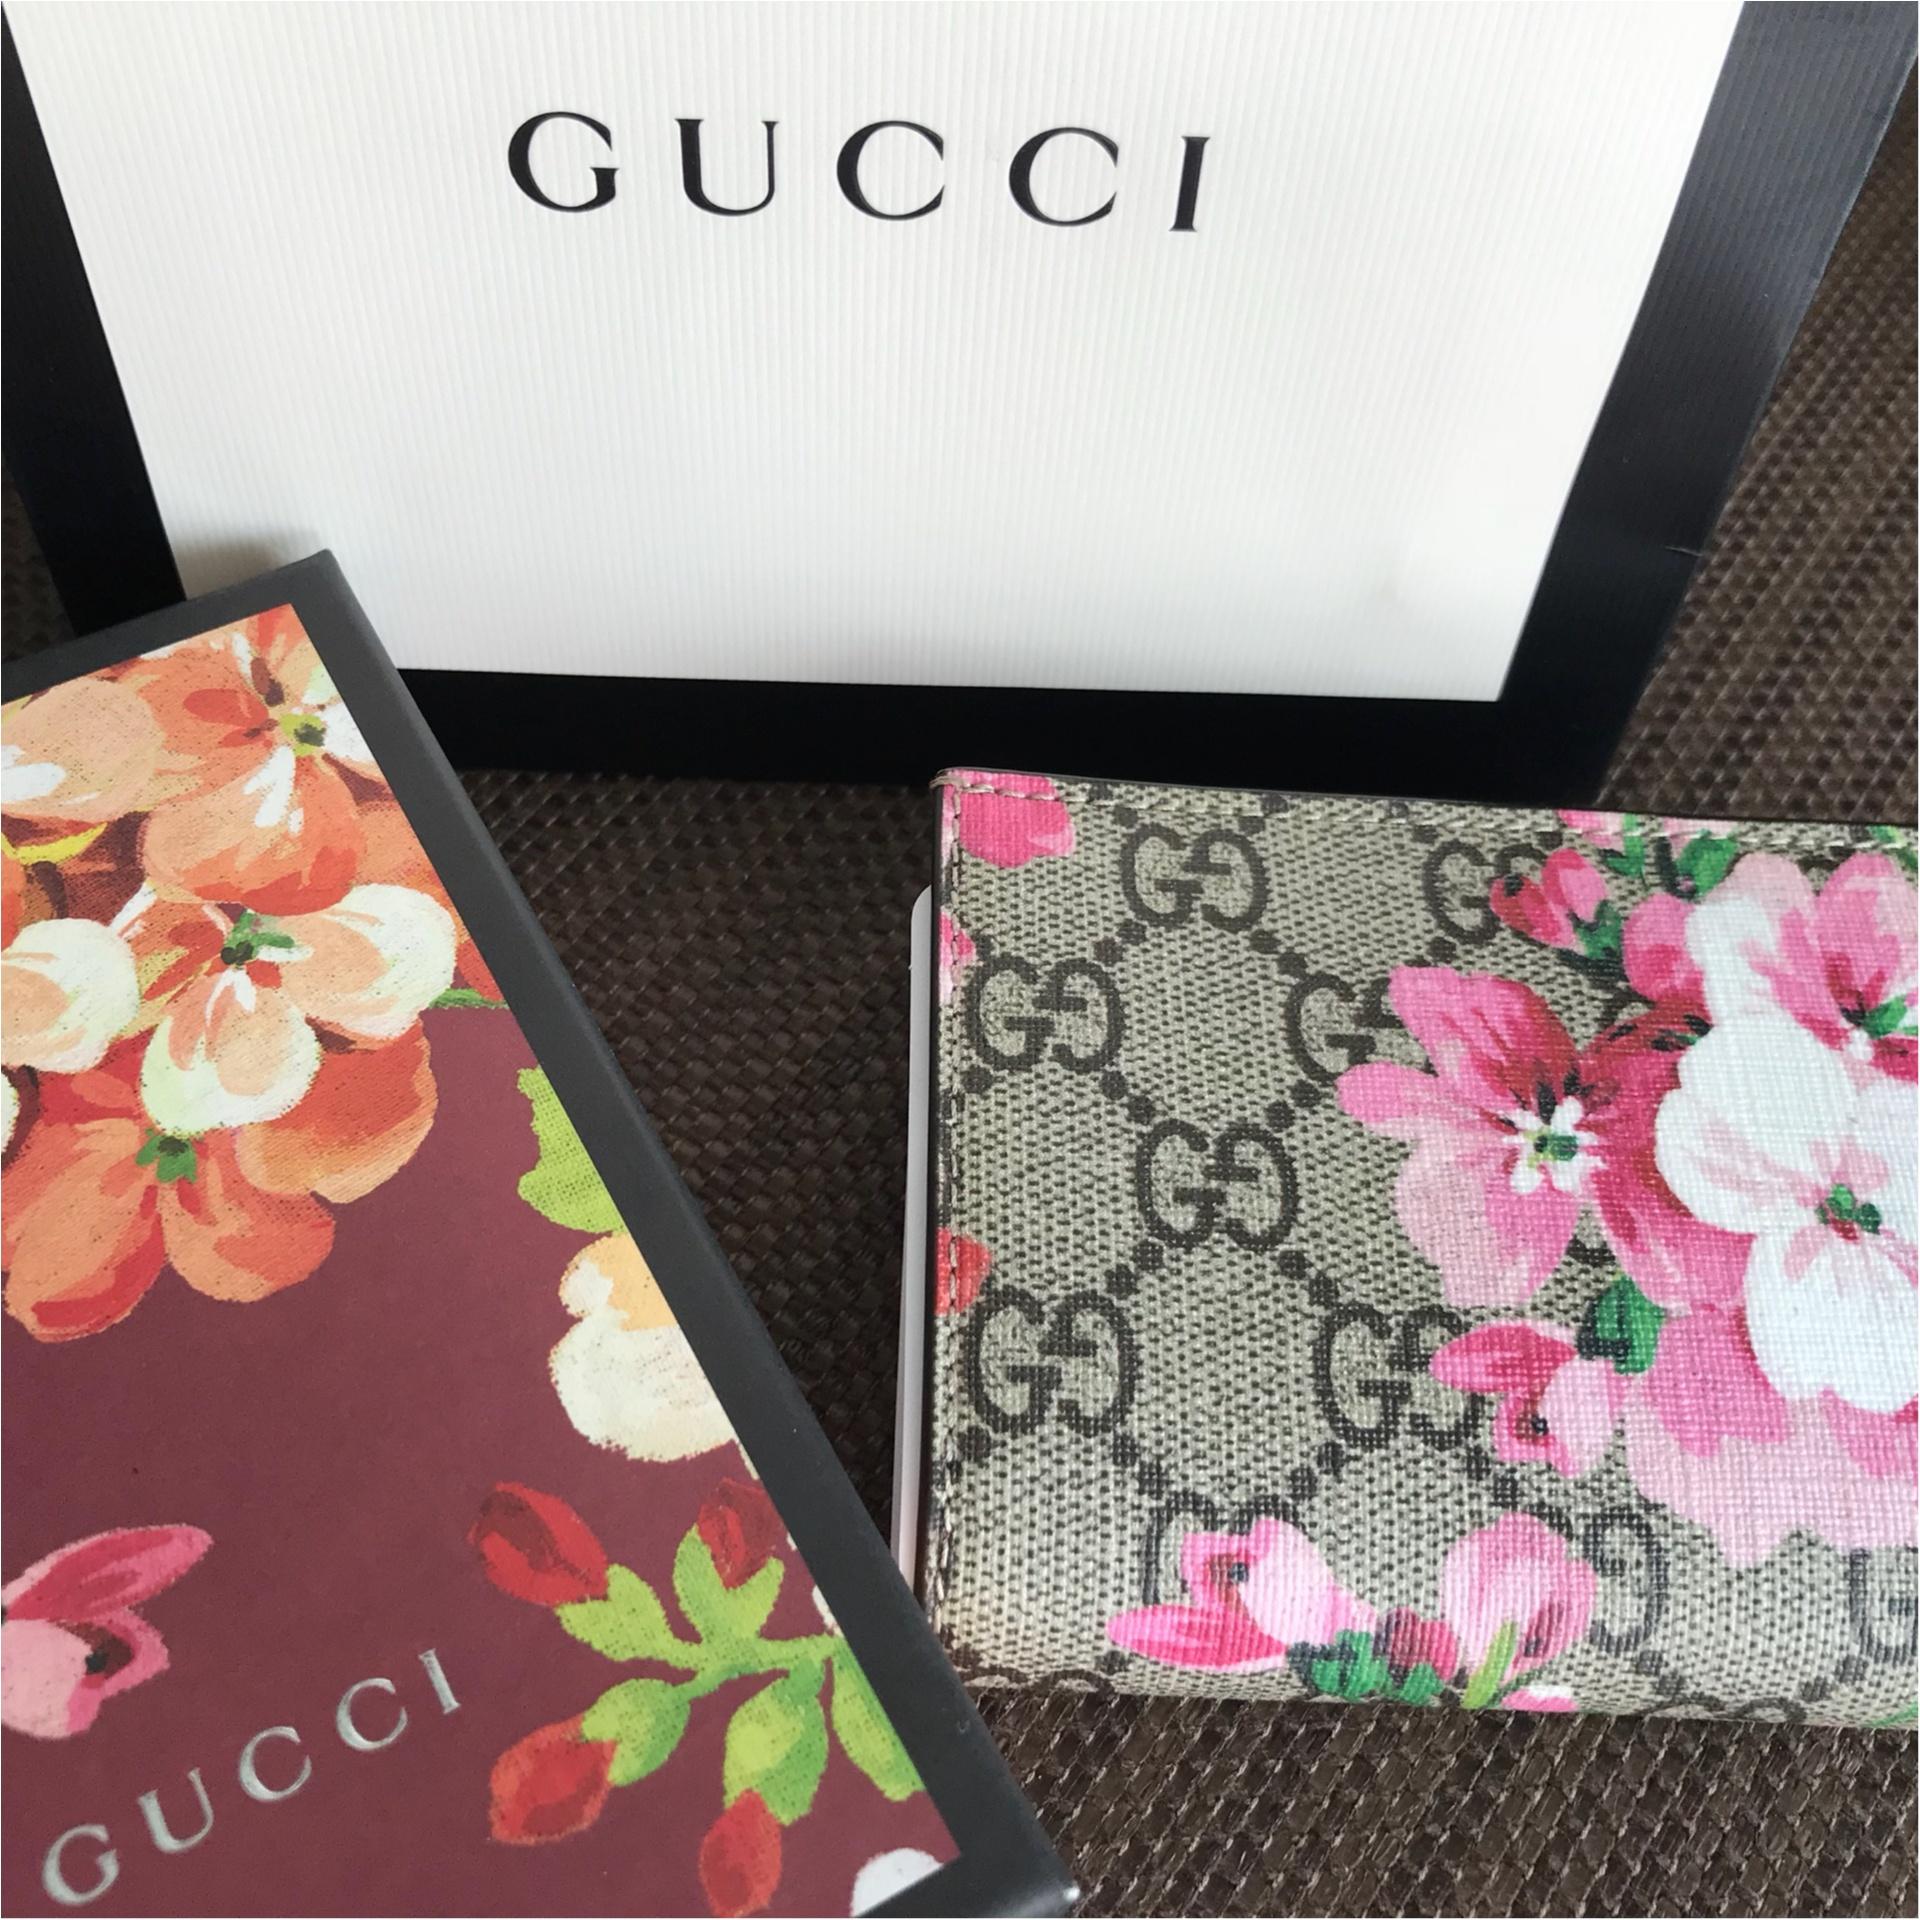 ★『GGブルームスコレクション』がとってもキュート♡念願の二つ折り財布を購入しました★_3